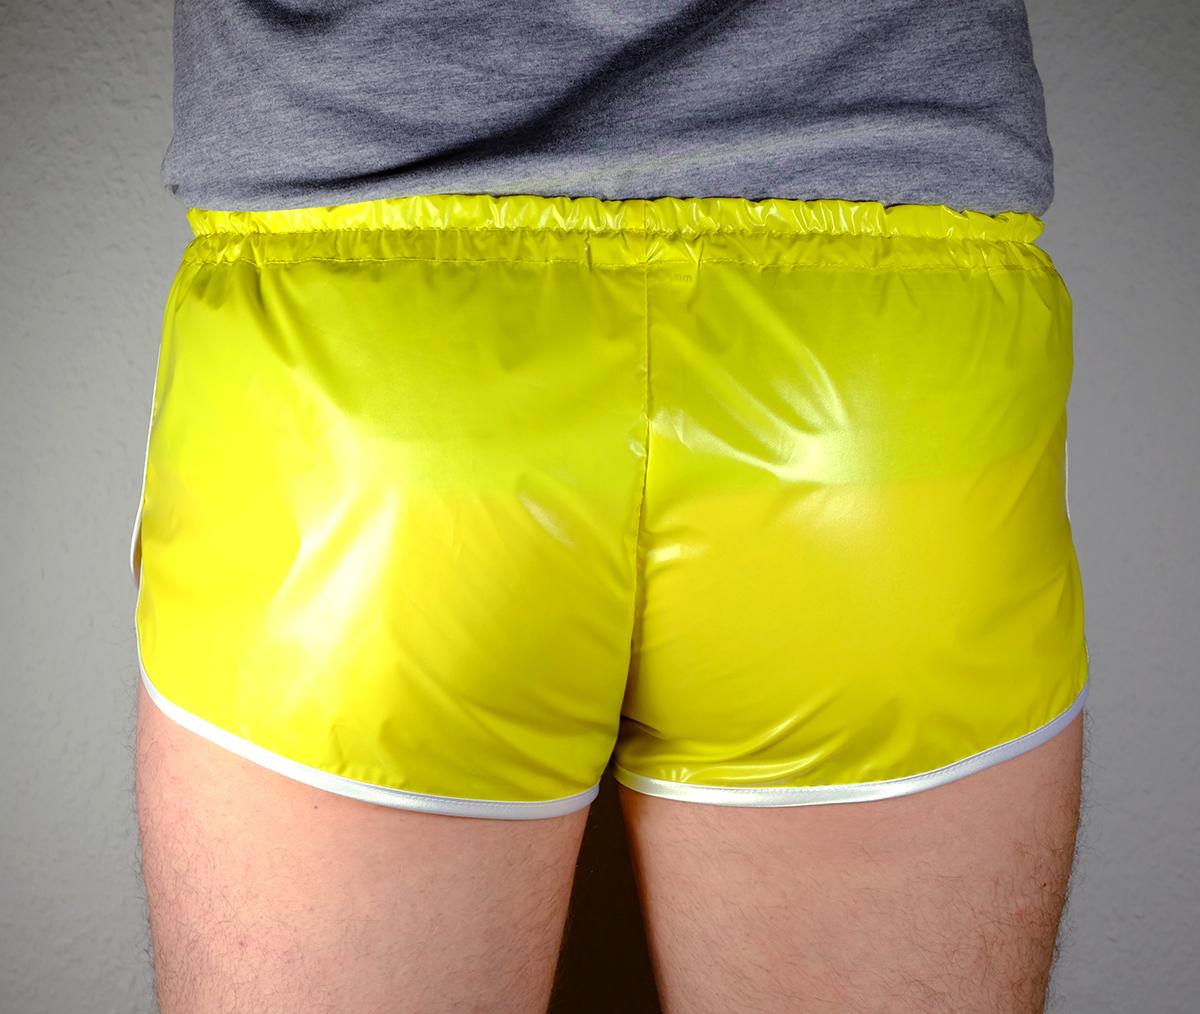 retro sprinter shorts very shiny for men plastic low waist | fabricat